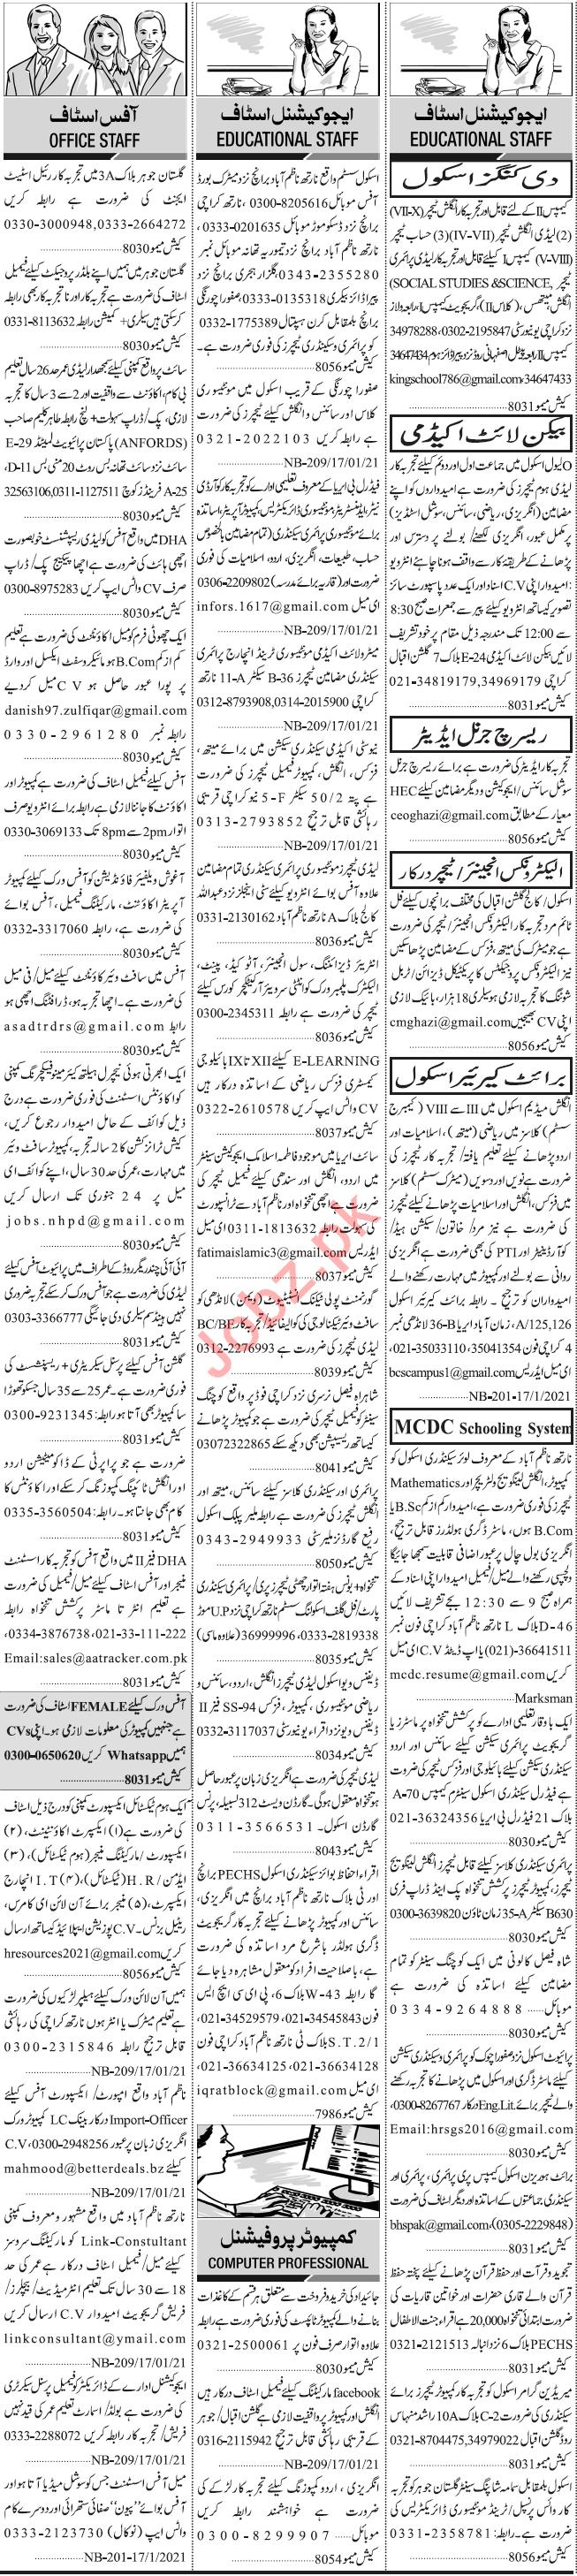 Daily Jang Sunday 17 January Educational Staff Jobs 2021